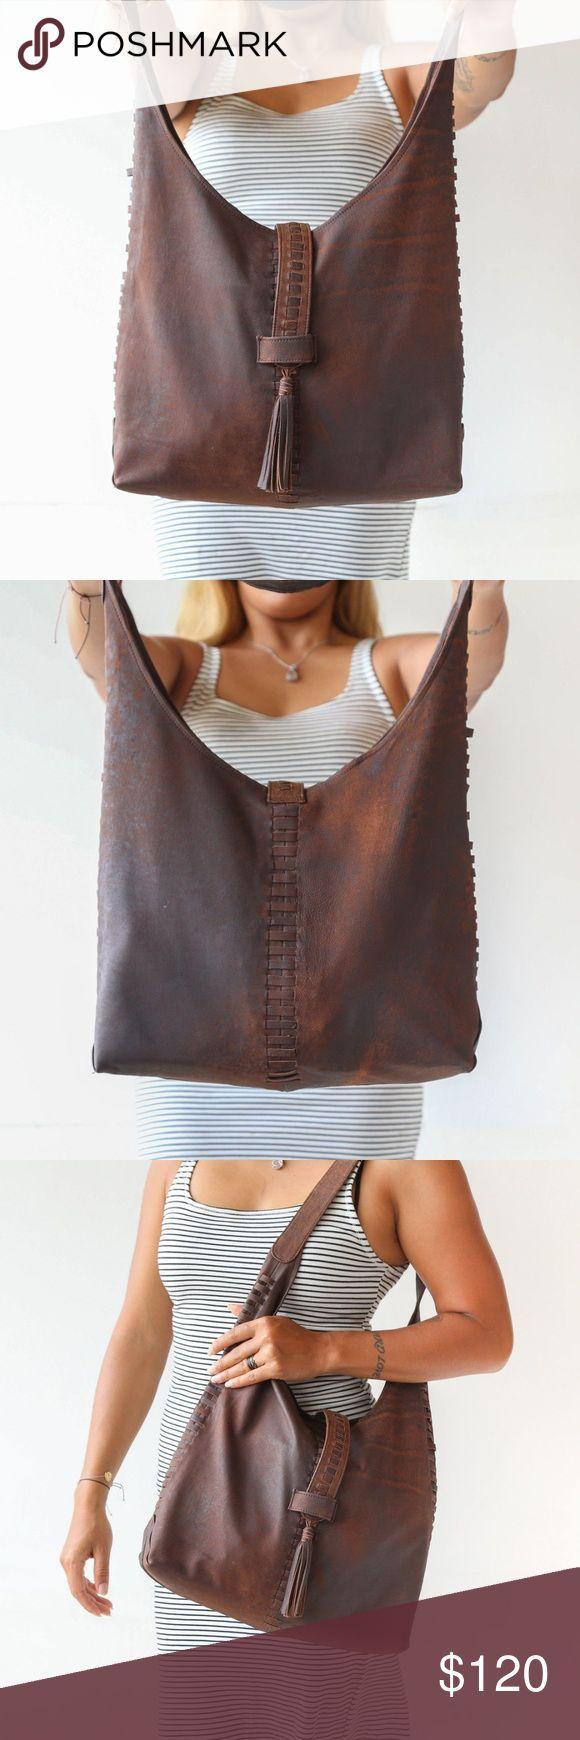 Leather Hobo Sling Bag beautiful leather hobo bag is comfortable soft and light Leather Hobo Sling Bag beautiful leather hobo bag is comfortable soft and light